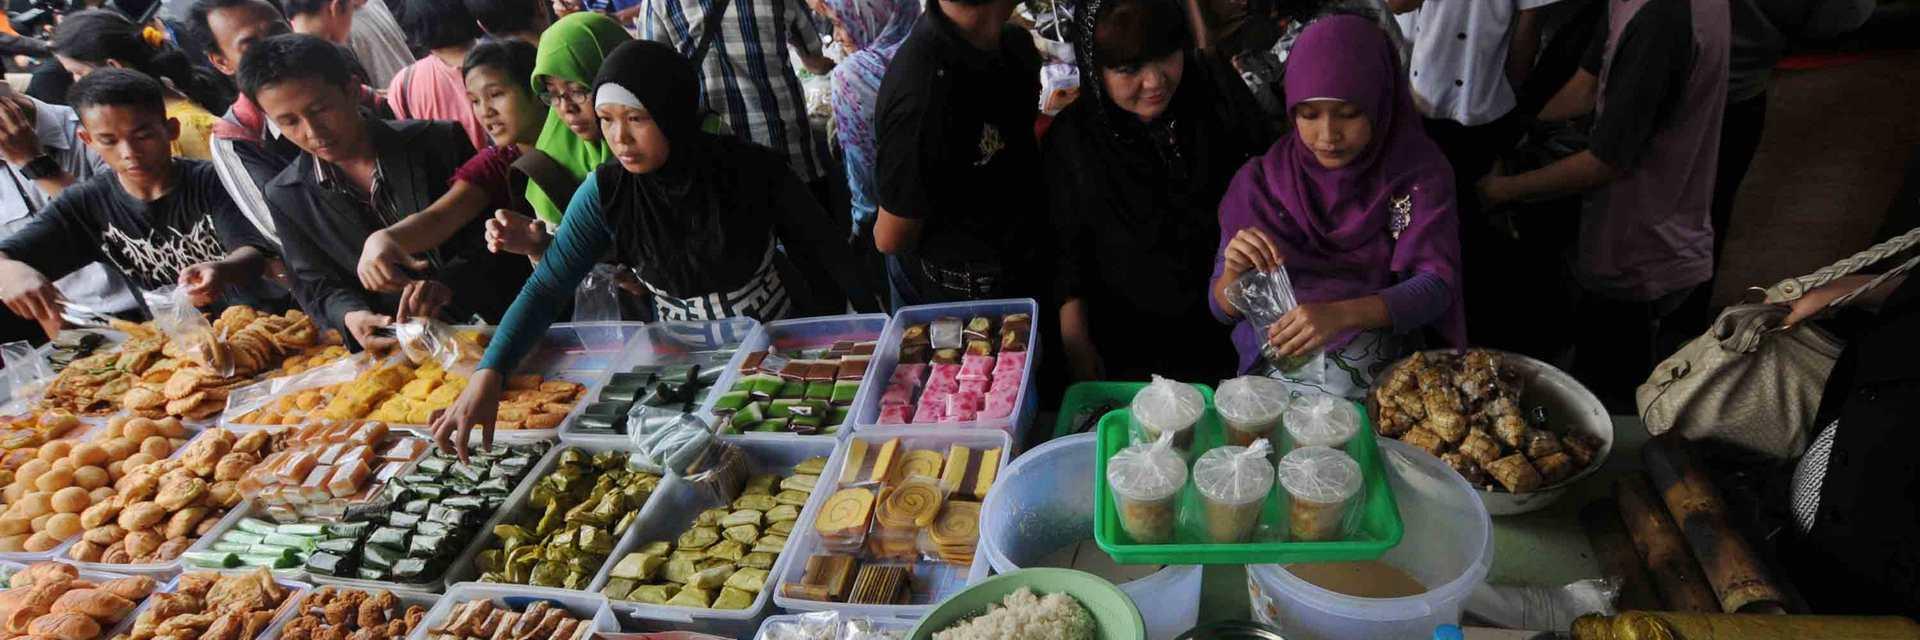 4 Tempat Berburu Takjil Paling Legendaris di Yogyakarta 4 Tempat Berburu Takjil Paling Legendaris di Yogyakarta - Dolan Dolen